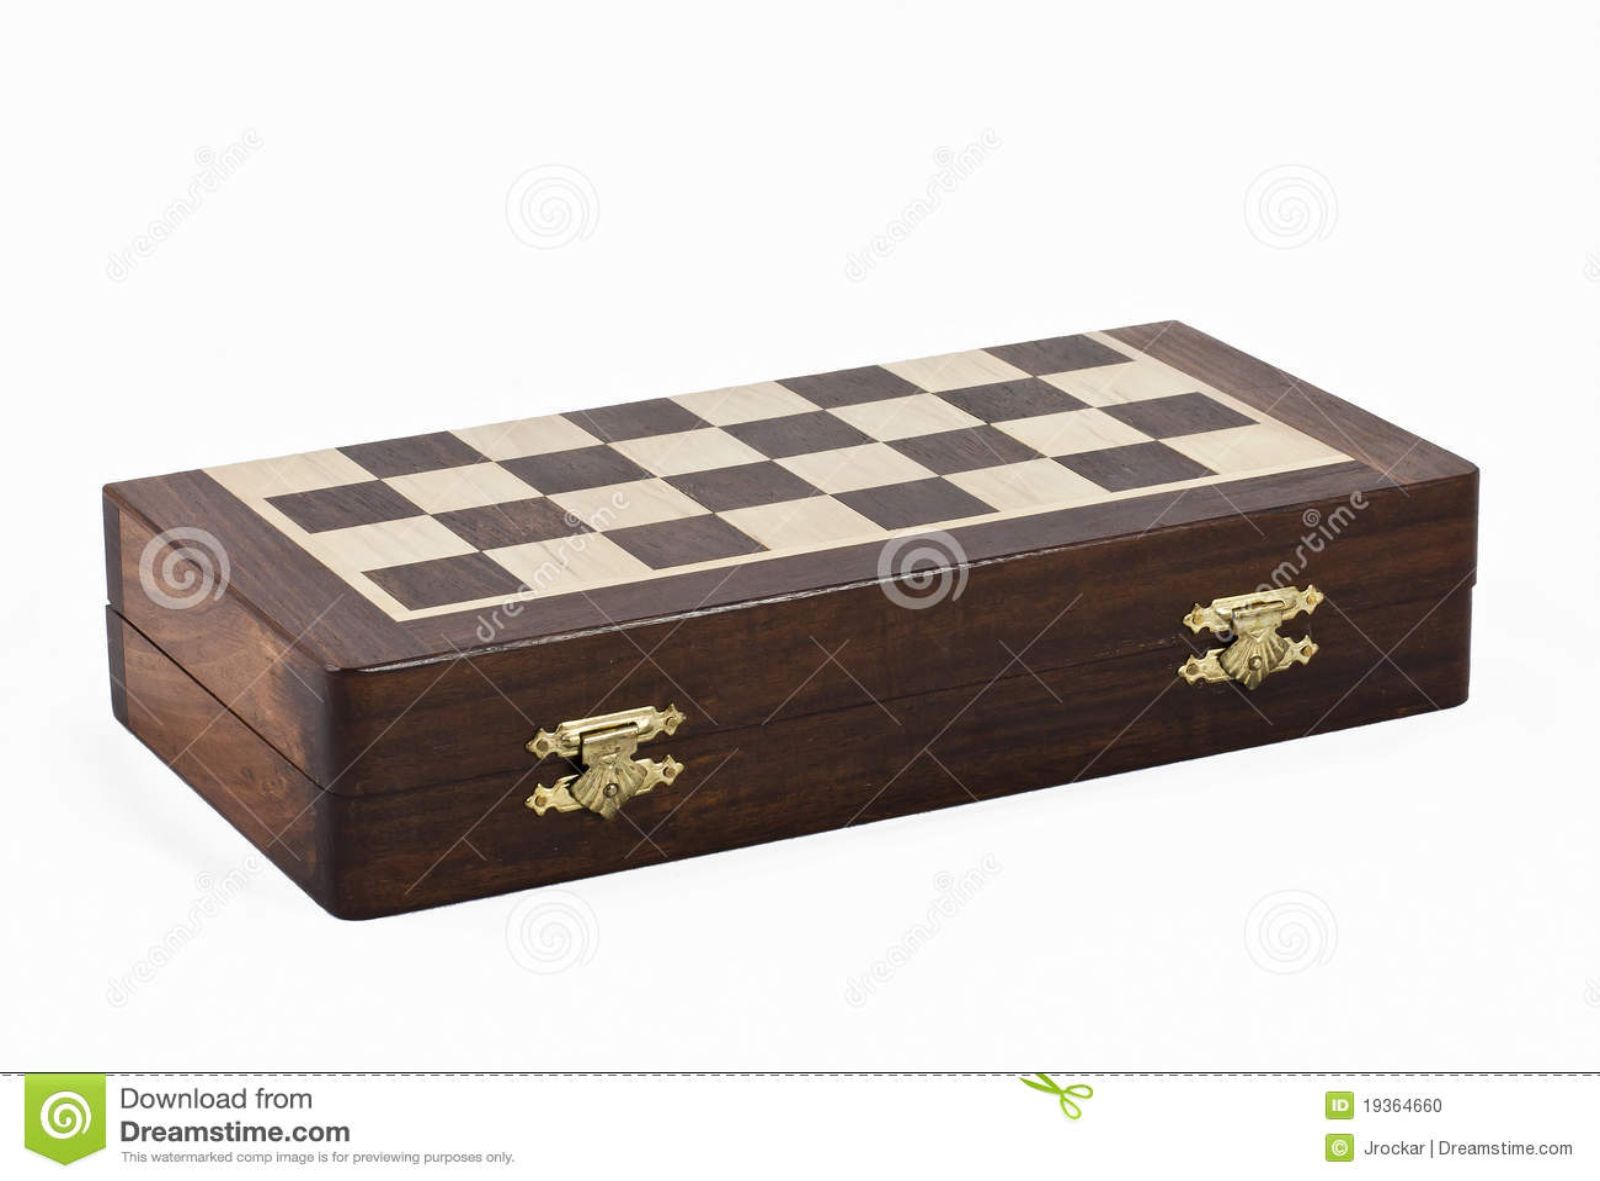 Chesboard de madeira do treaveller